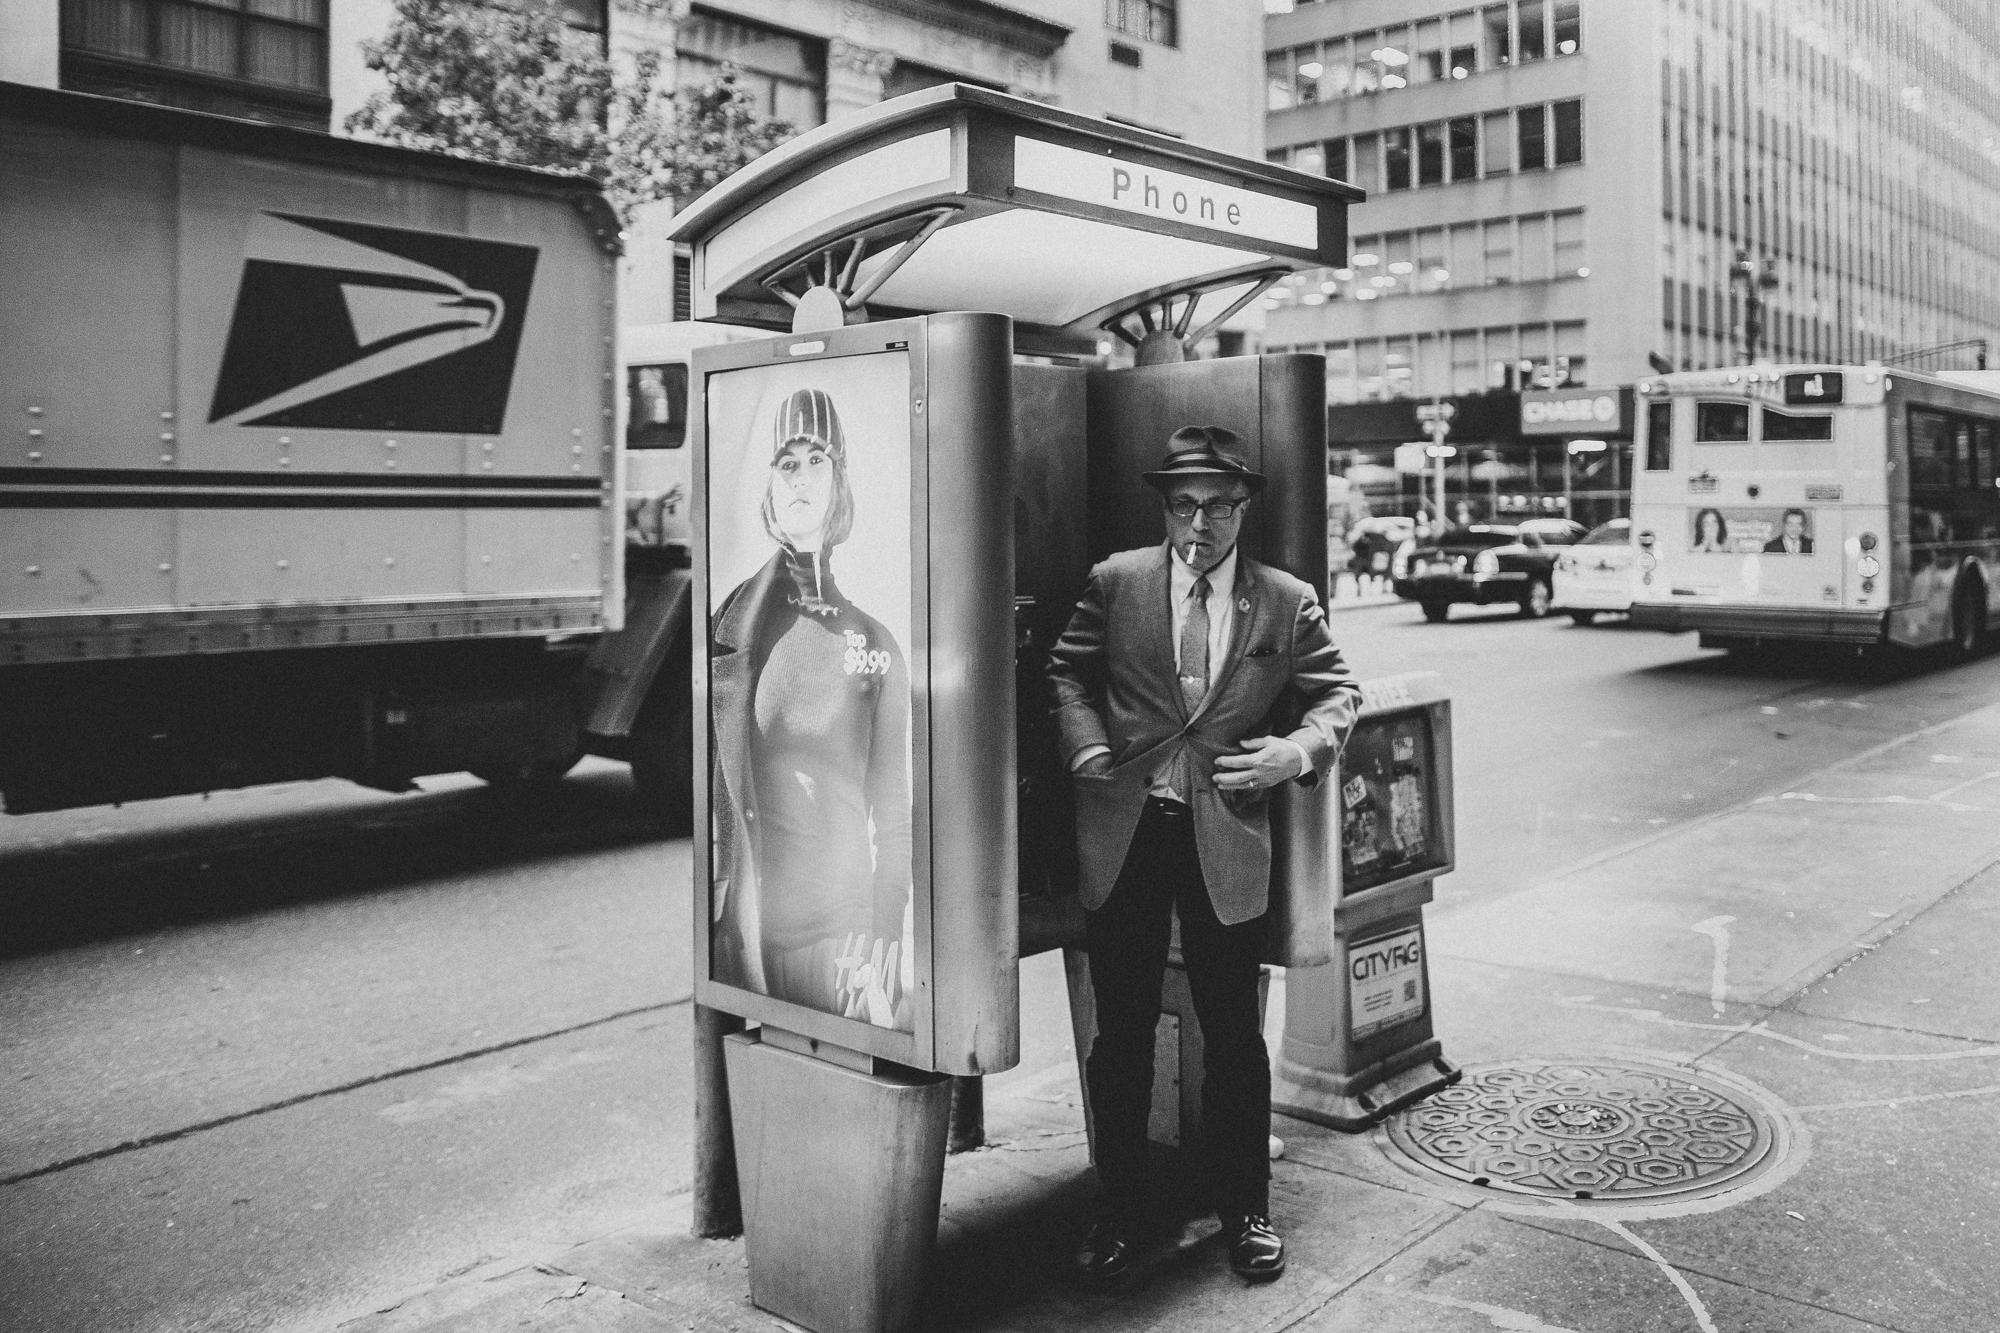 Midtown, NYC. 2016